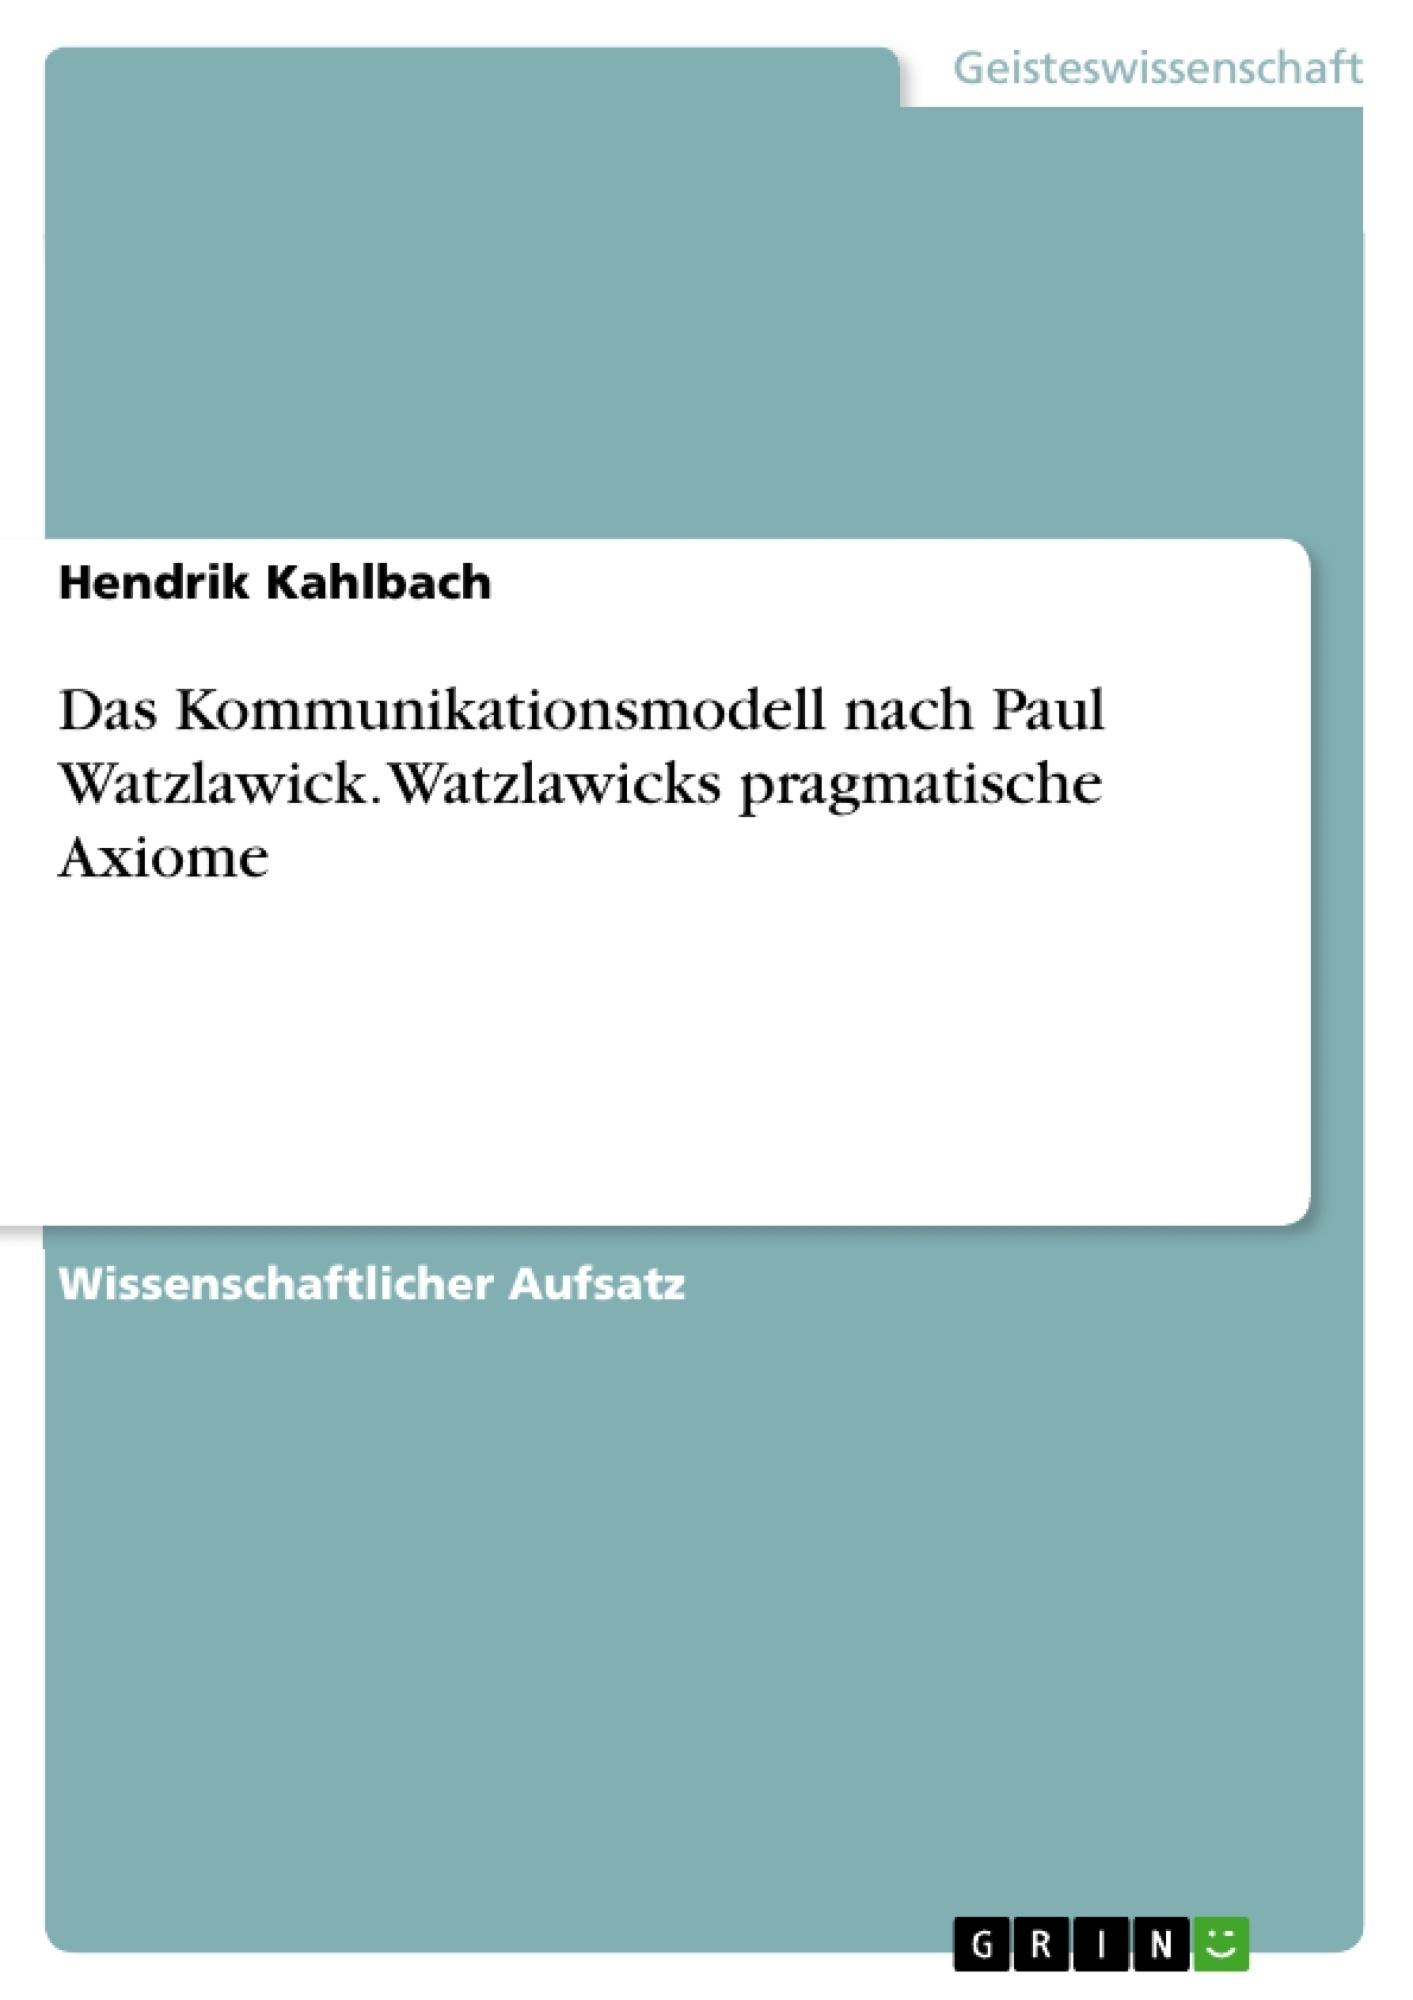 Titel: Das Kommunikationsmodell nach Paul Watzlawick.  Watzlawicks pragmatische Axiome